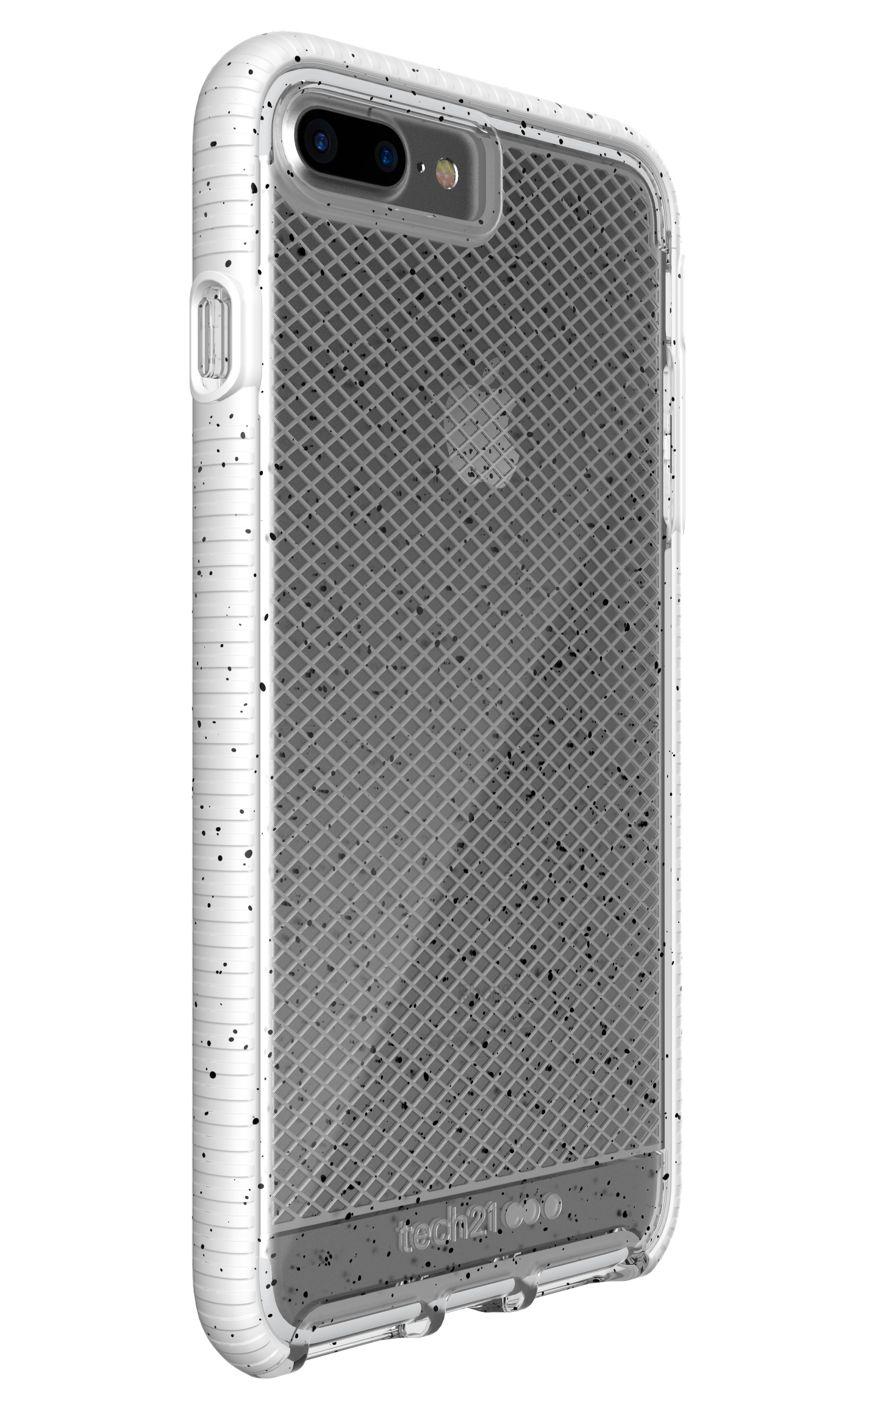 cheaper d1722 90e3d Tech21 Evo Check Active Edition for iPhone 8 Plus, 7 Plus - Clear/White